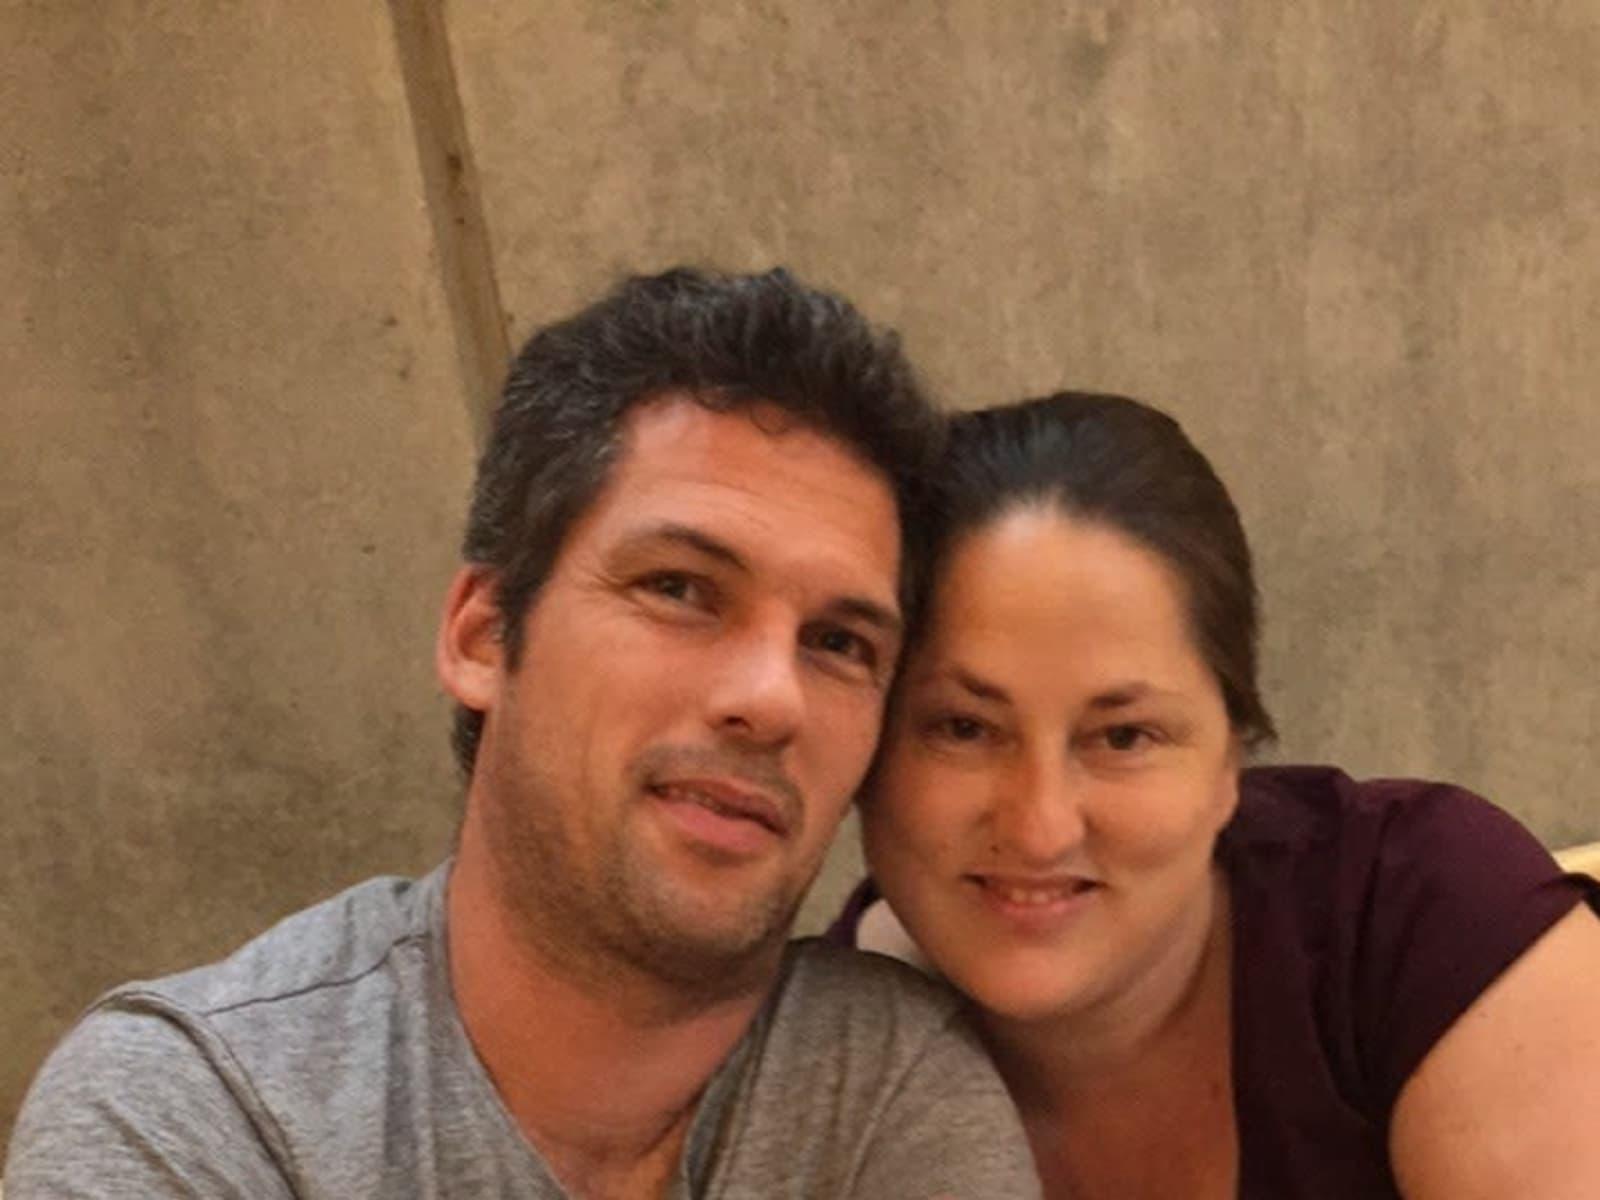 Diana & Marcel from Bregenz, Austria